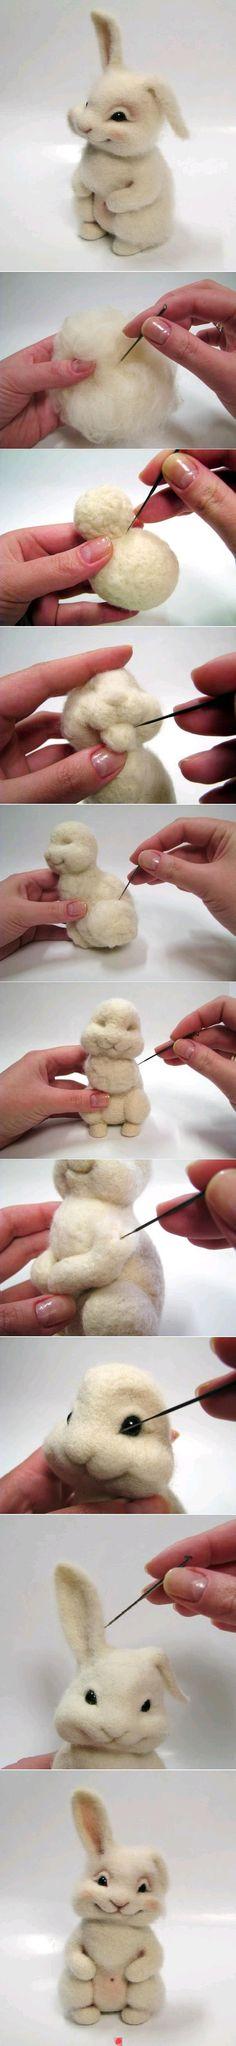 rabbit, diy ideas, needle felted animals, diy crafts, stuffed animal storage, felted wool, felting tutorials, needl felt, diy projects